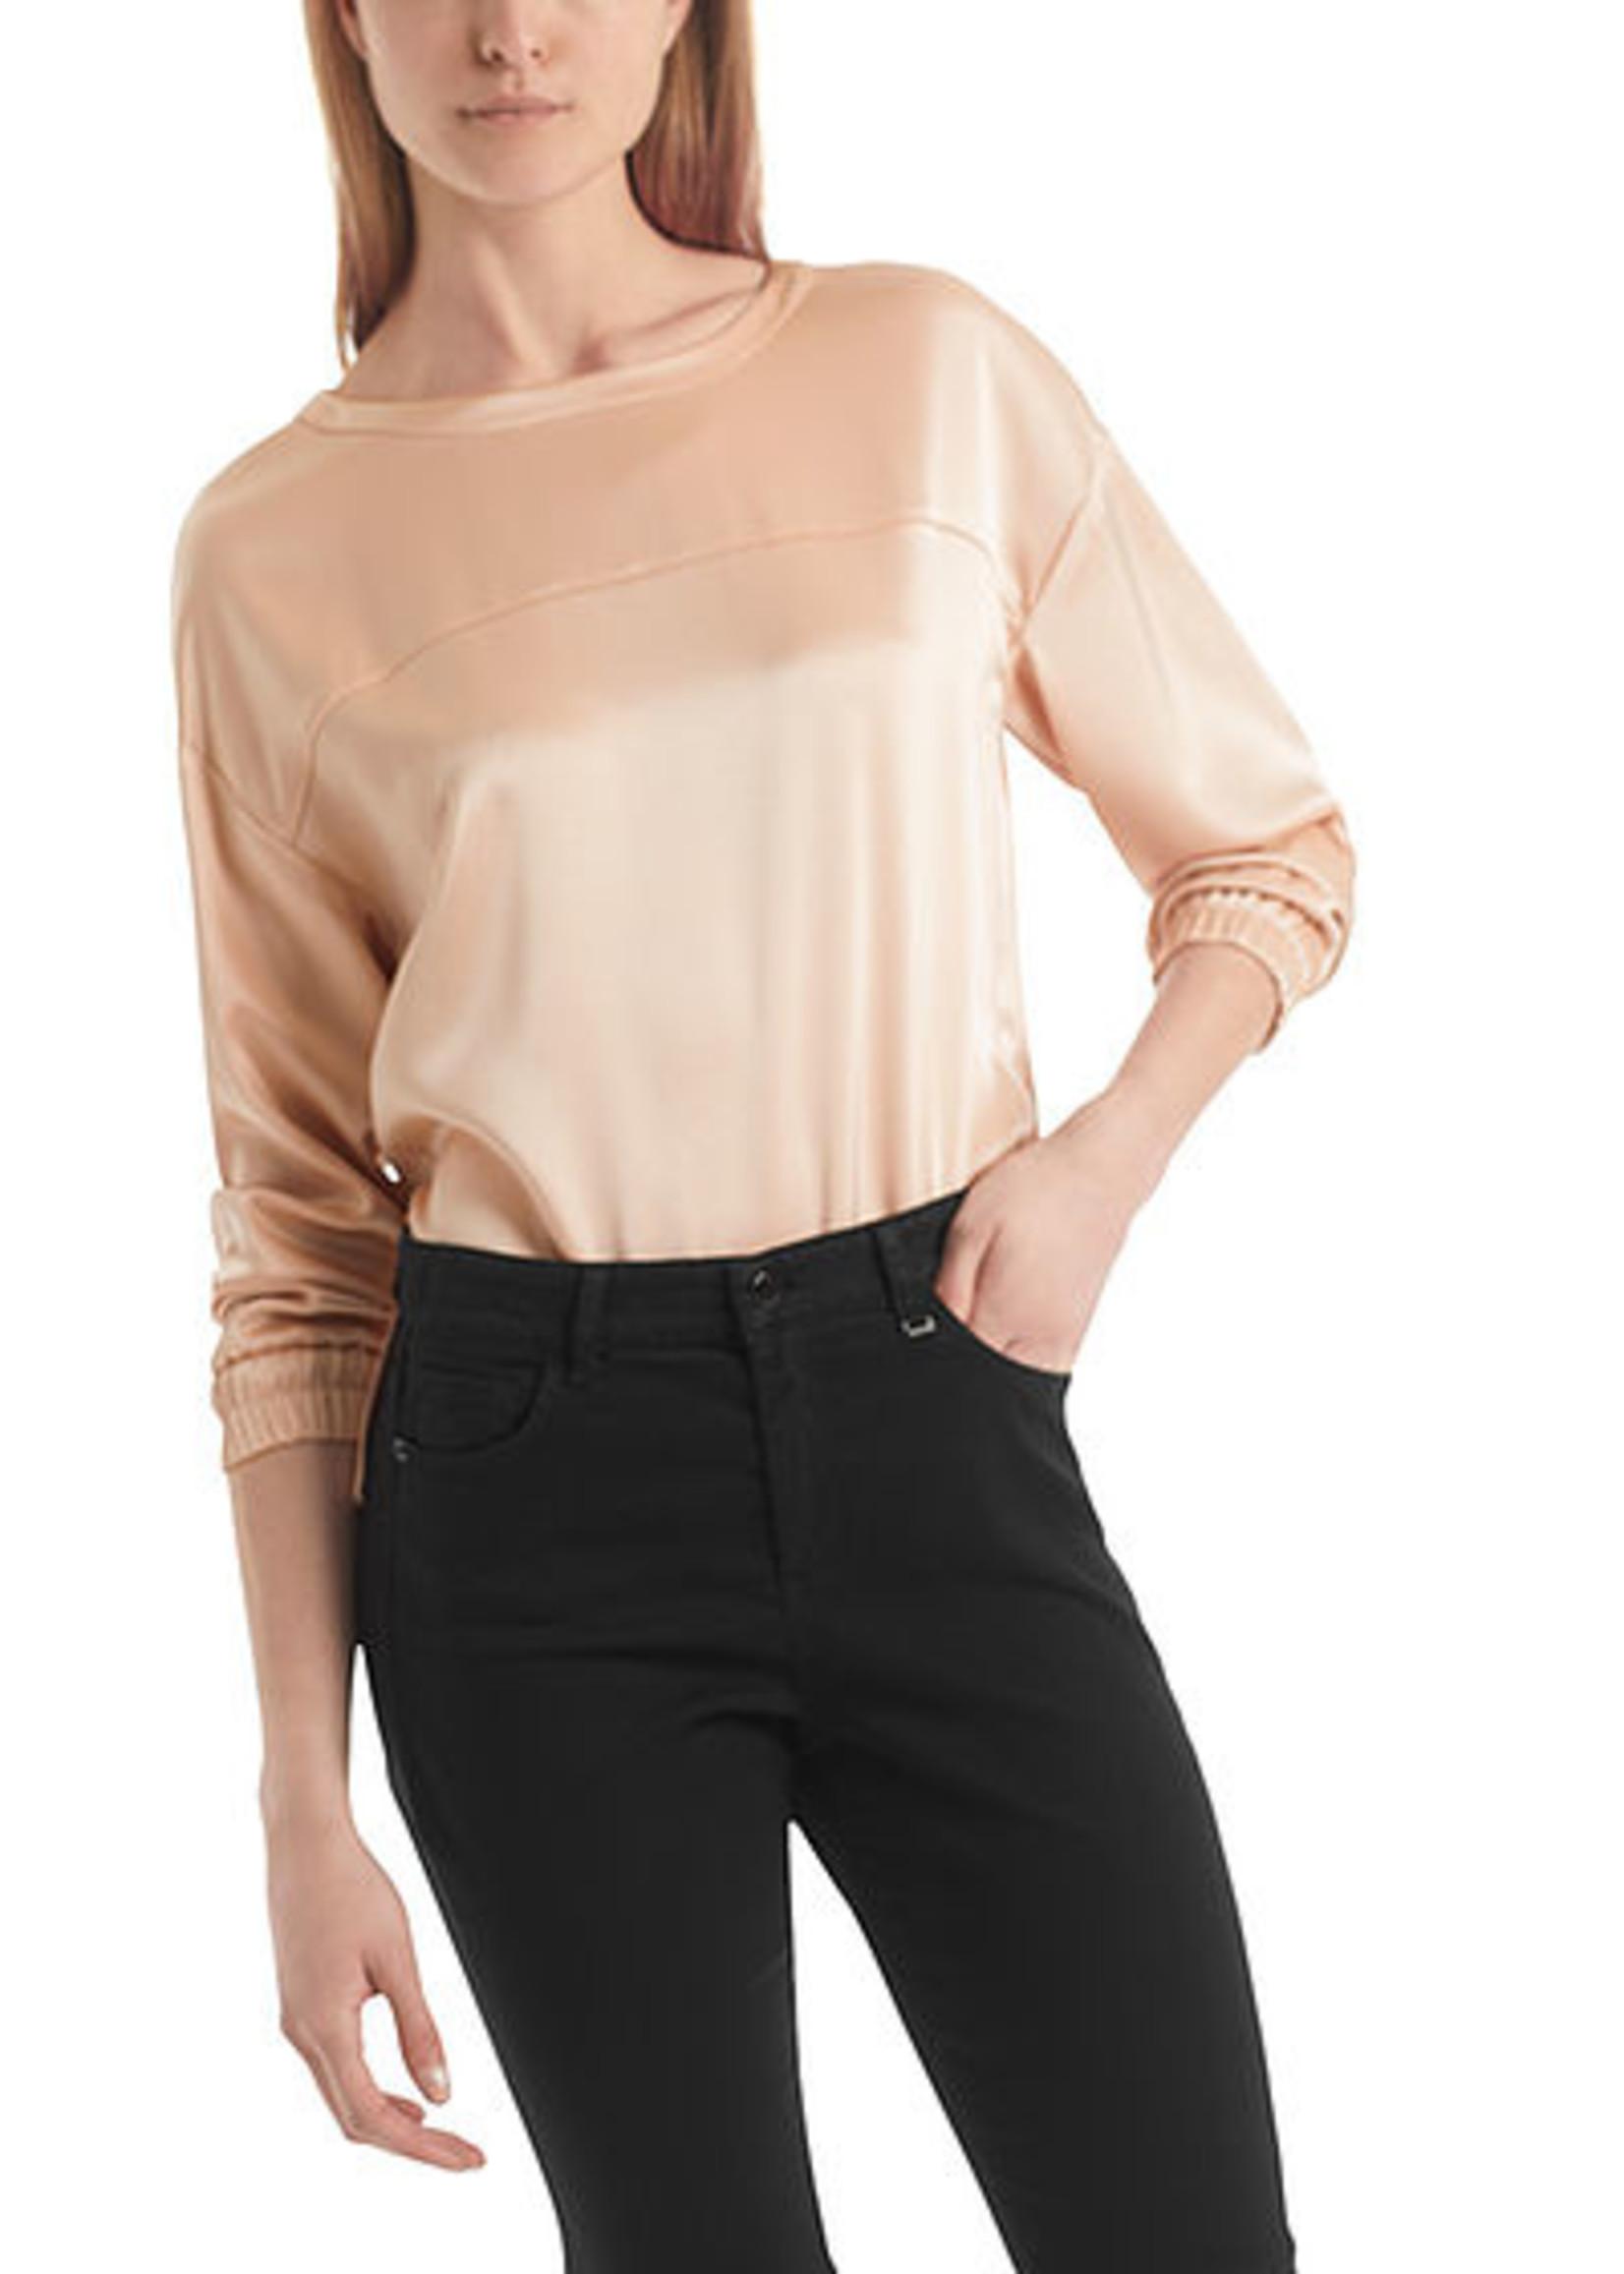 Sweatshirt RC 44.02 W15 sandy beige